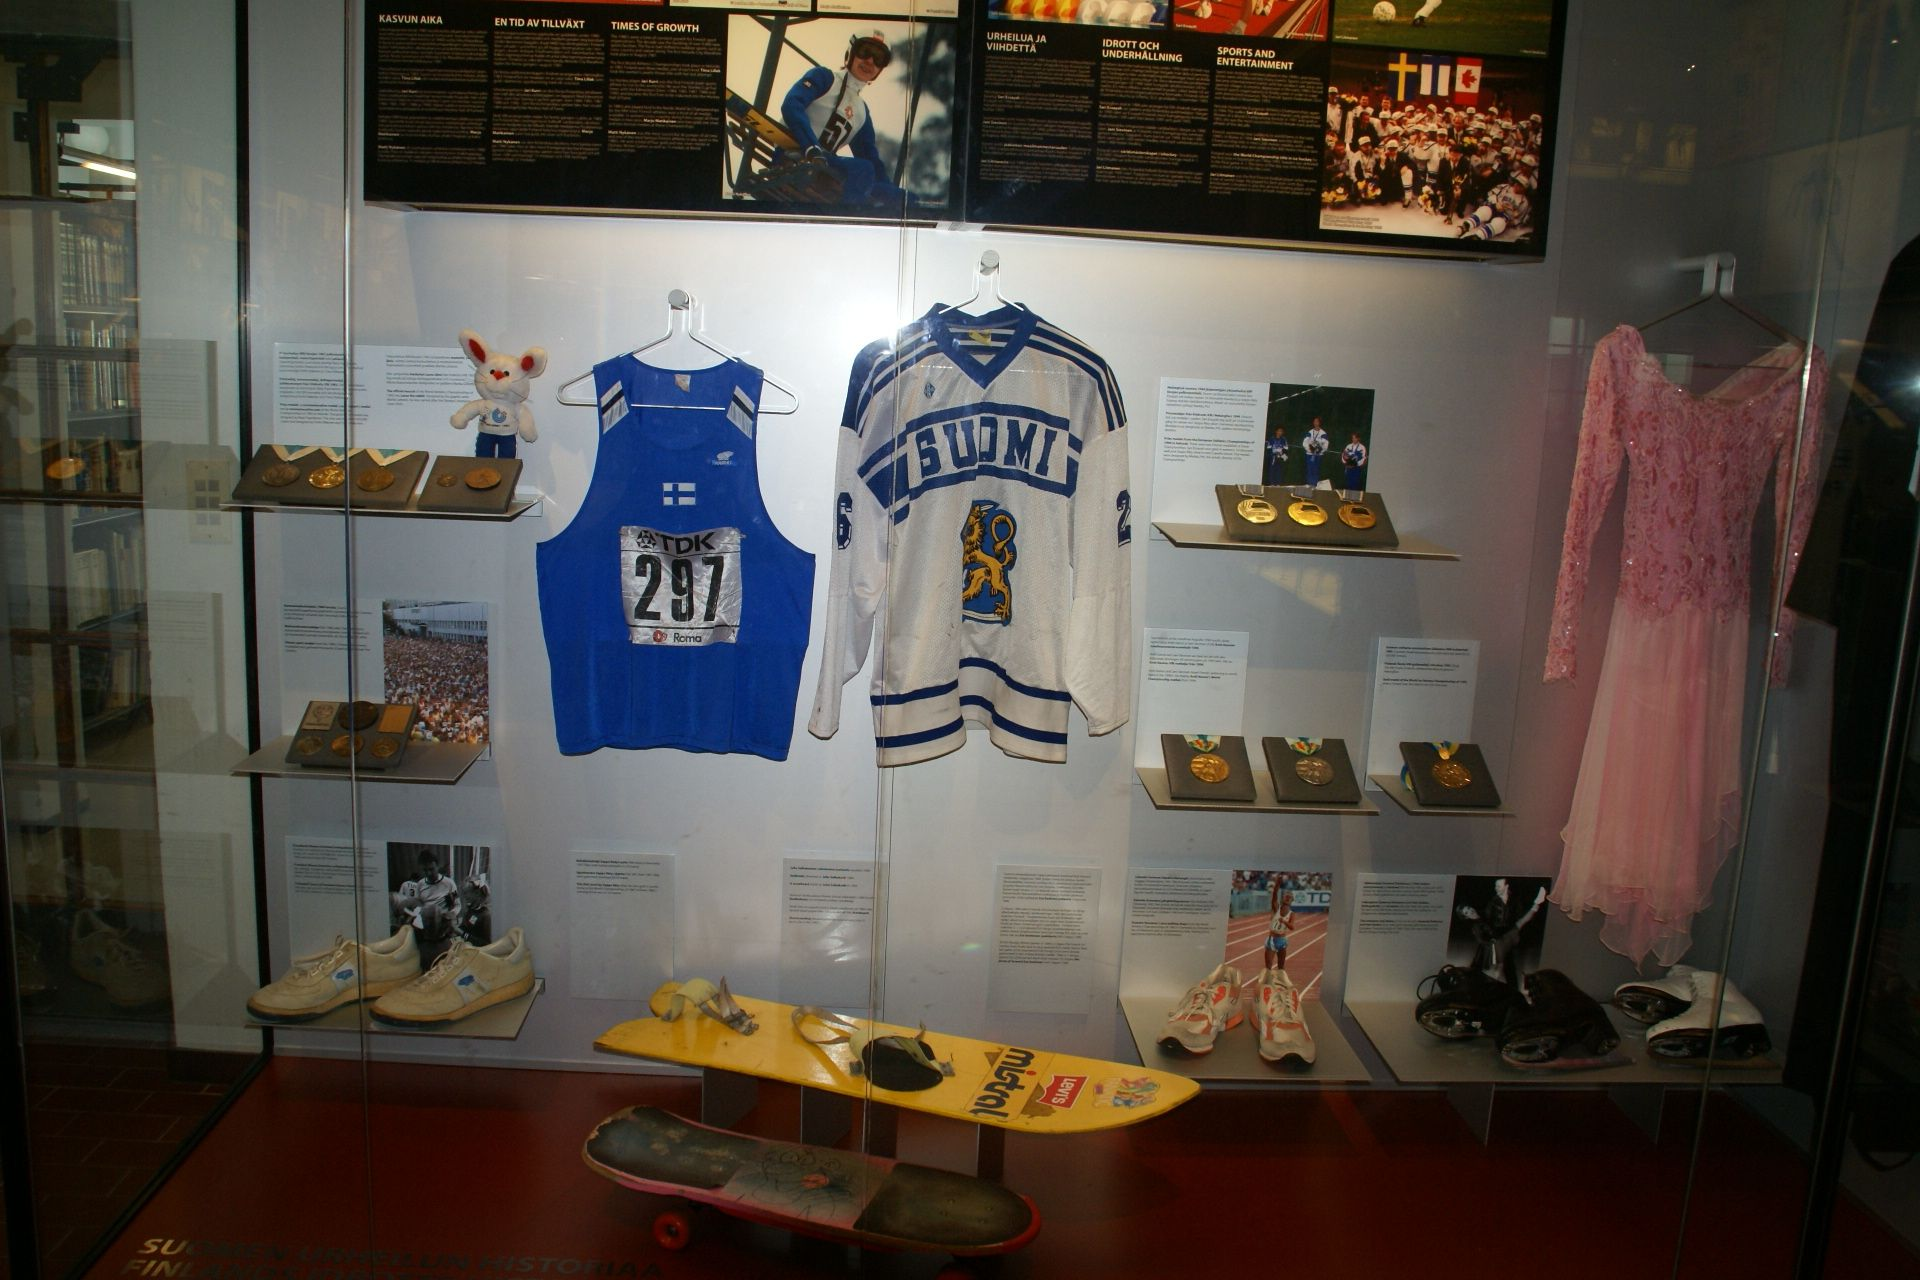 Suomen Urheilumuseo